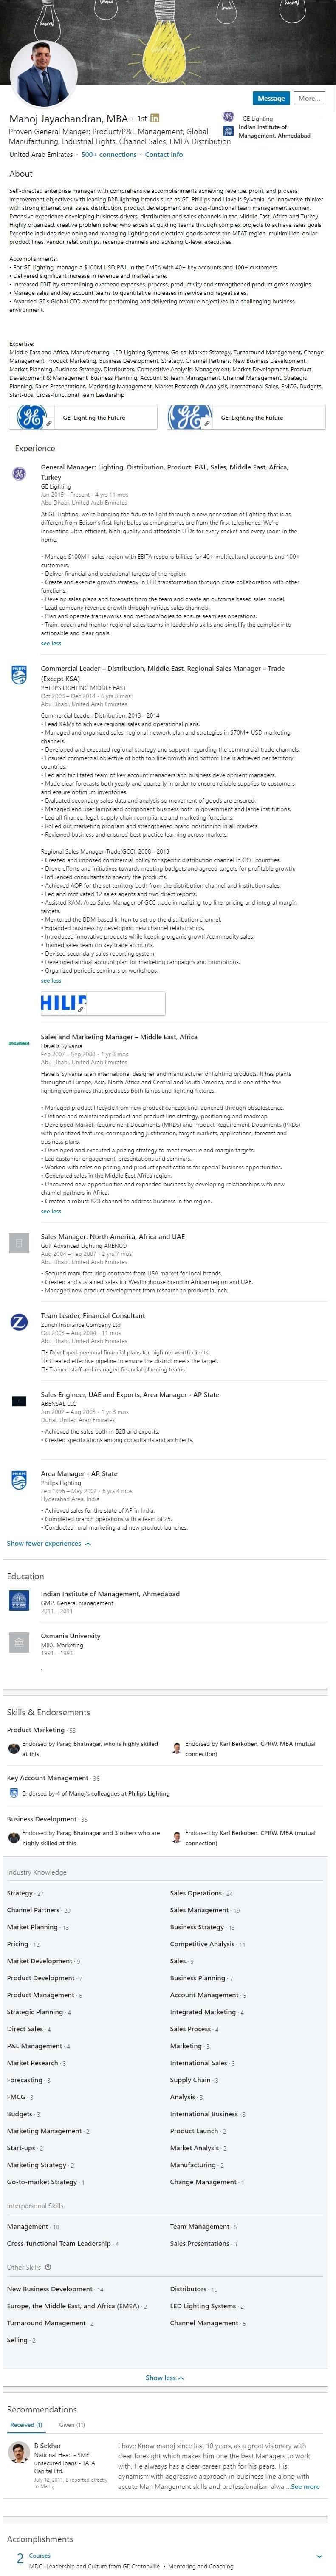 Linkedin Profile Example UAE Abu Dhabi 1707